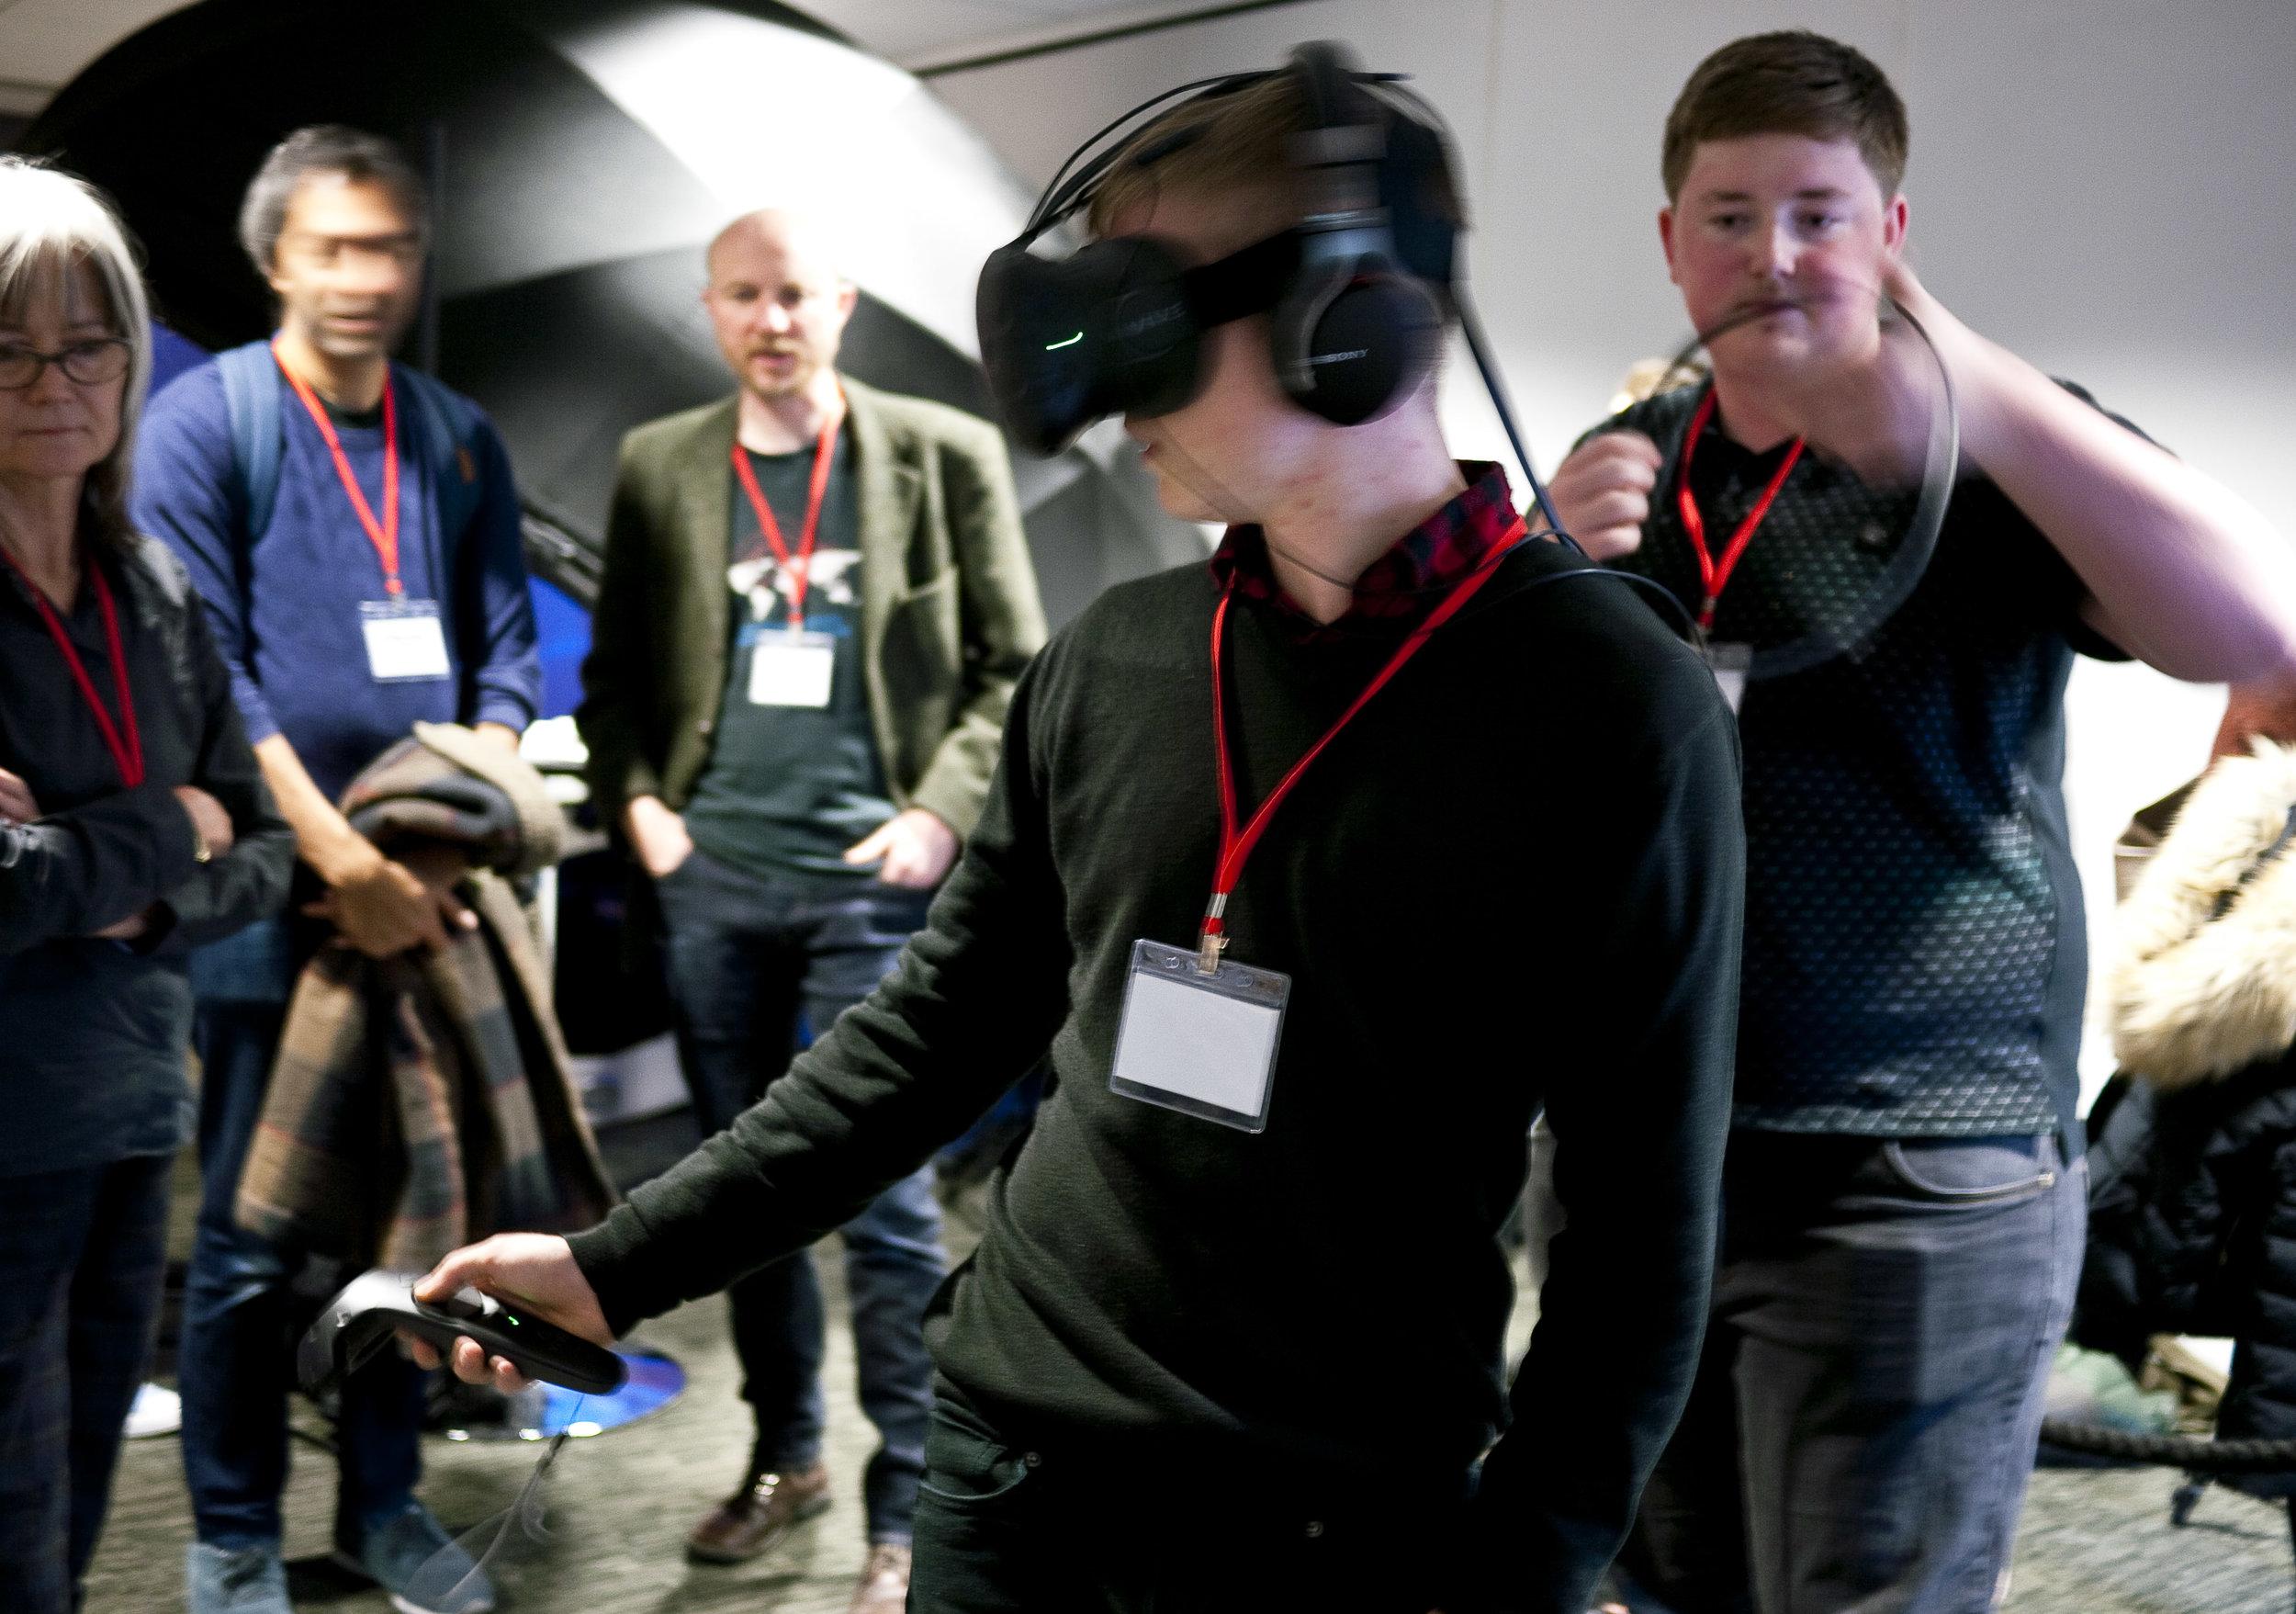 Boys using Vive VR.jpg